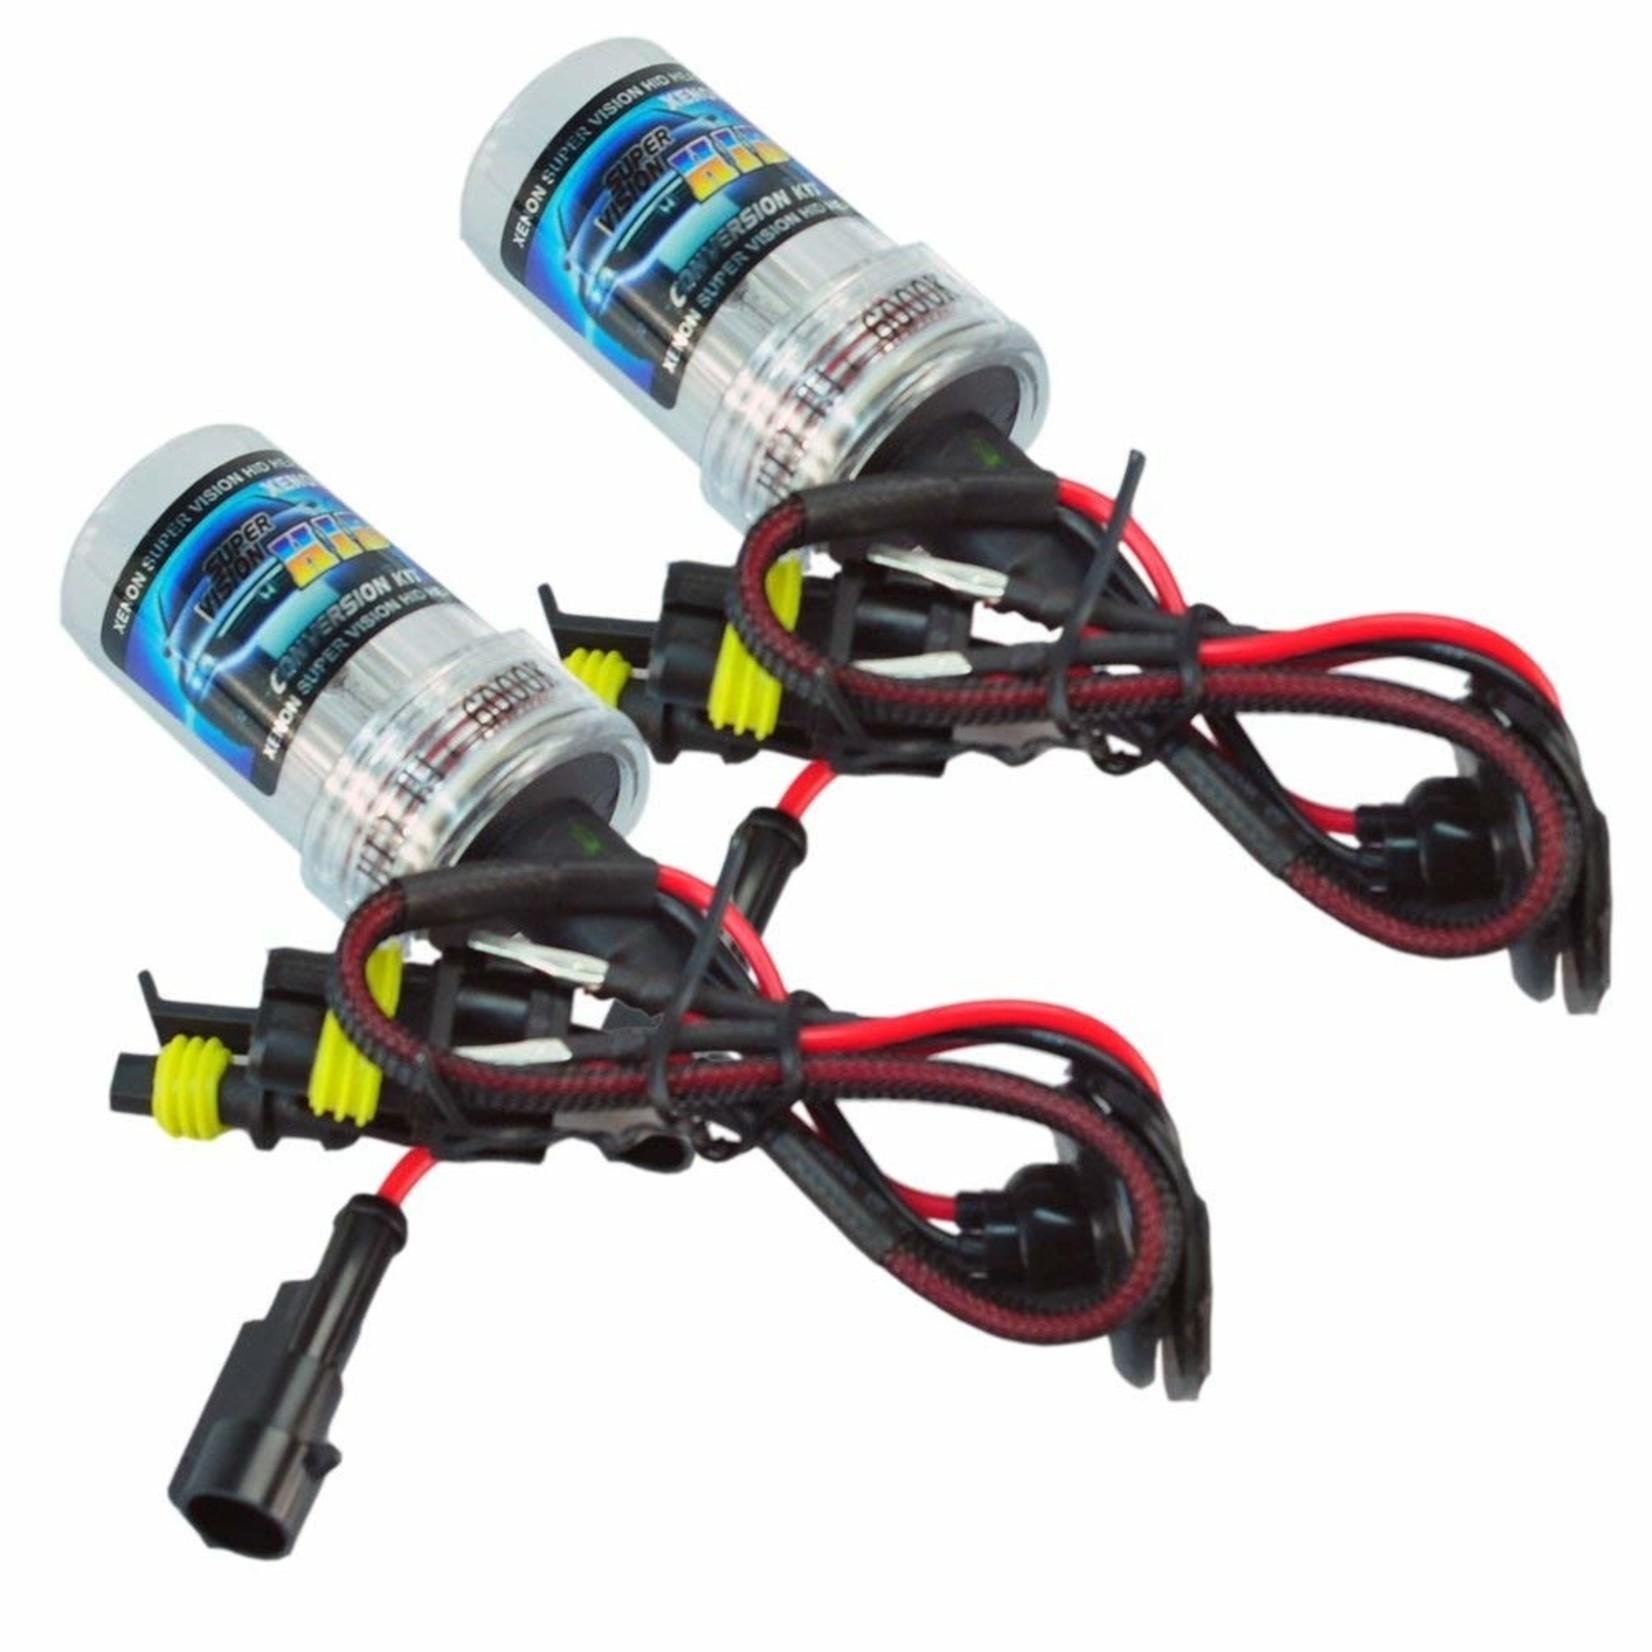 XEOD H9 Xenon vervangingslamp